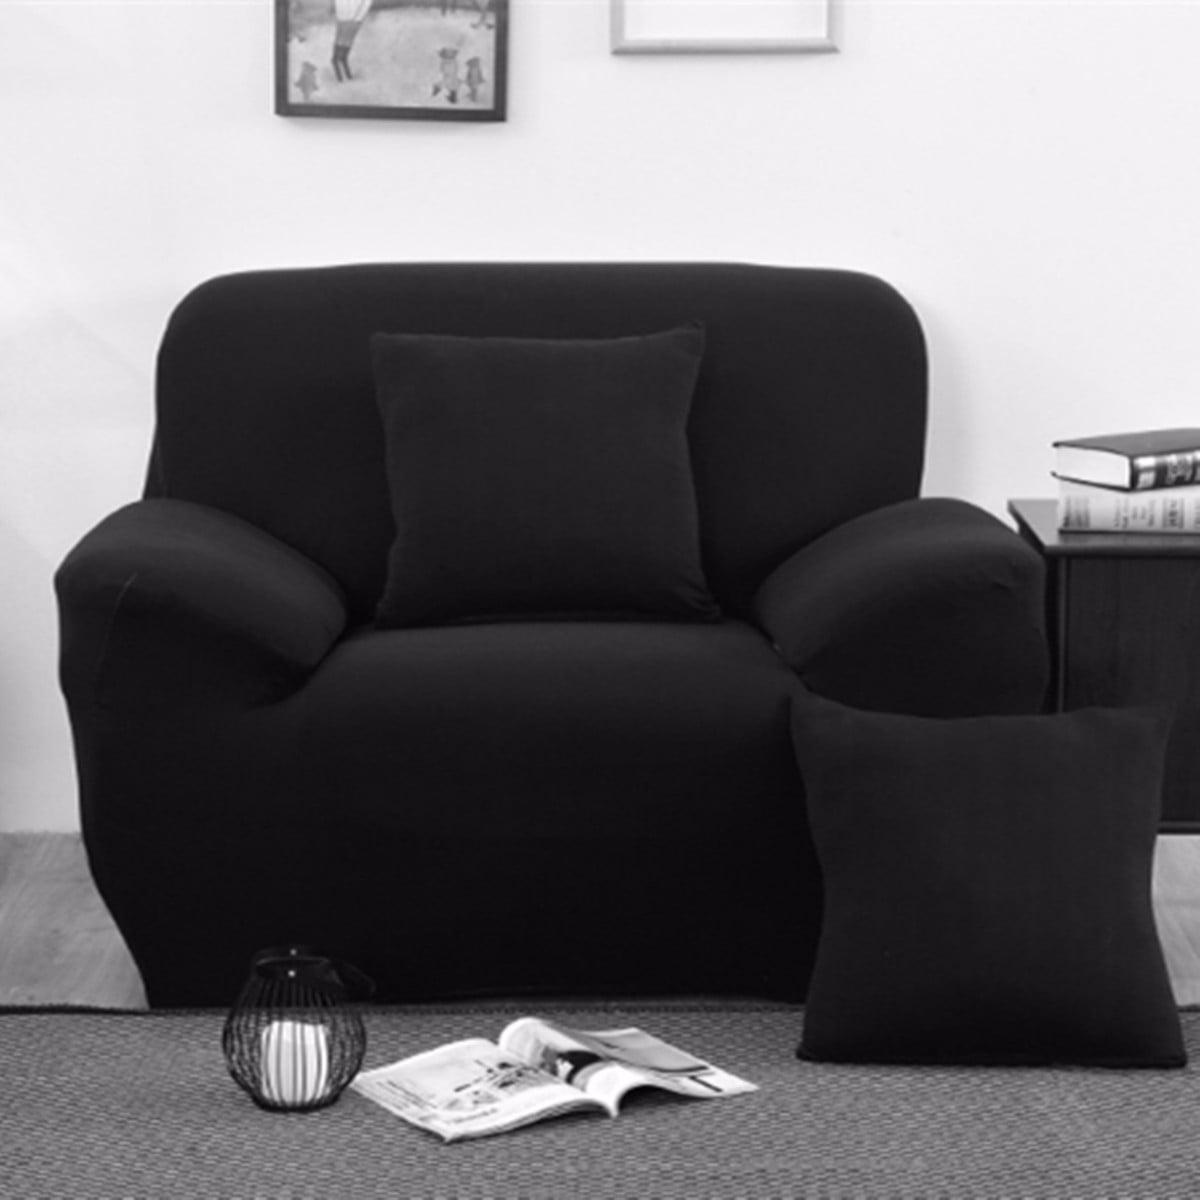 Fesselnde Sofa Ecke Beste Wahl Elastic Stretch Fabric Furniture Slipcover Pet Dog